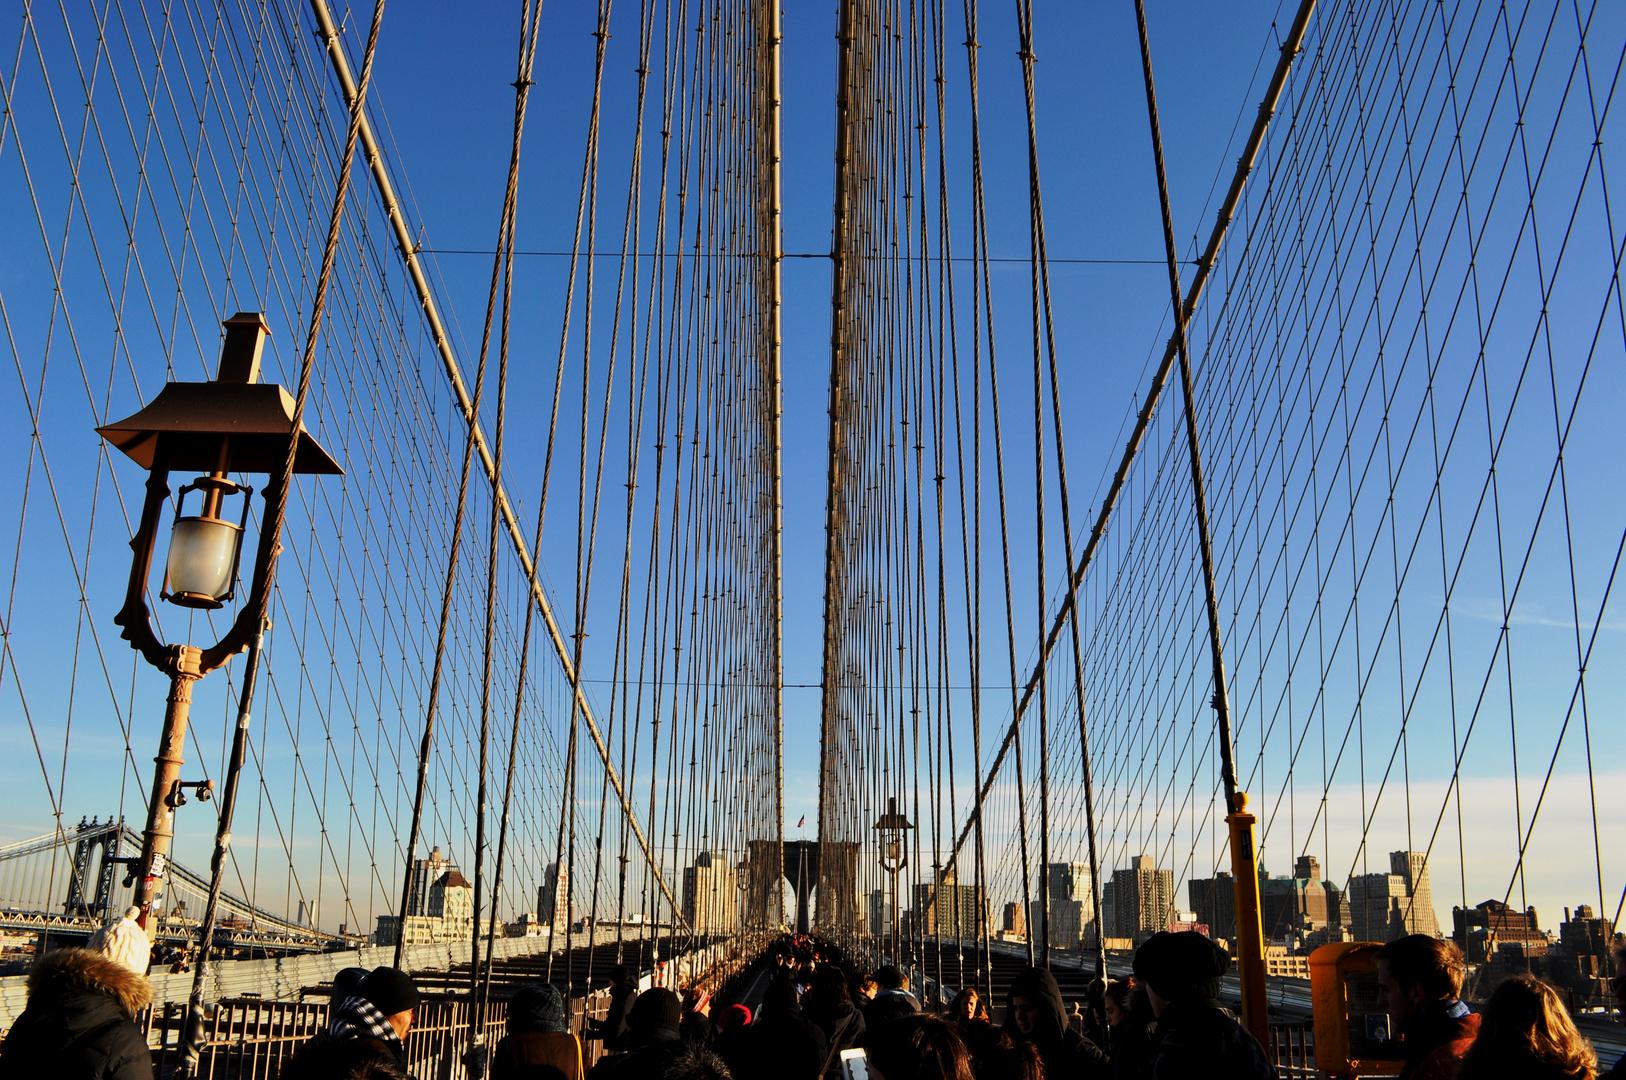 Brooklyn Bridge - New York City - Manhatten - Brooklyn - USA